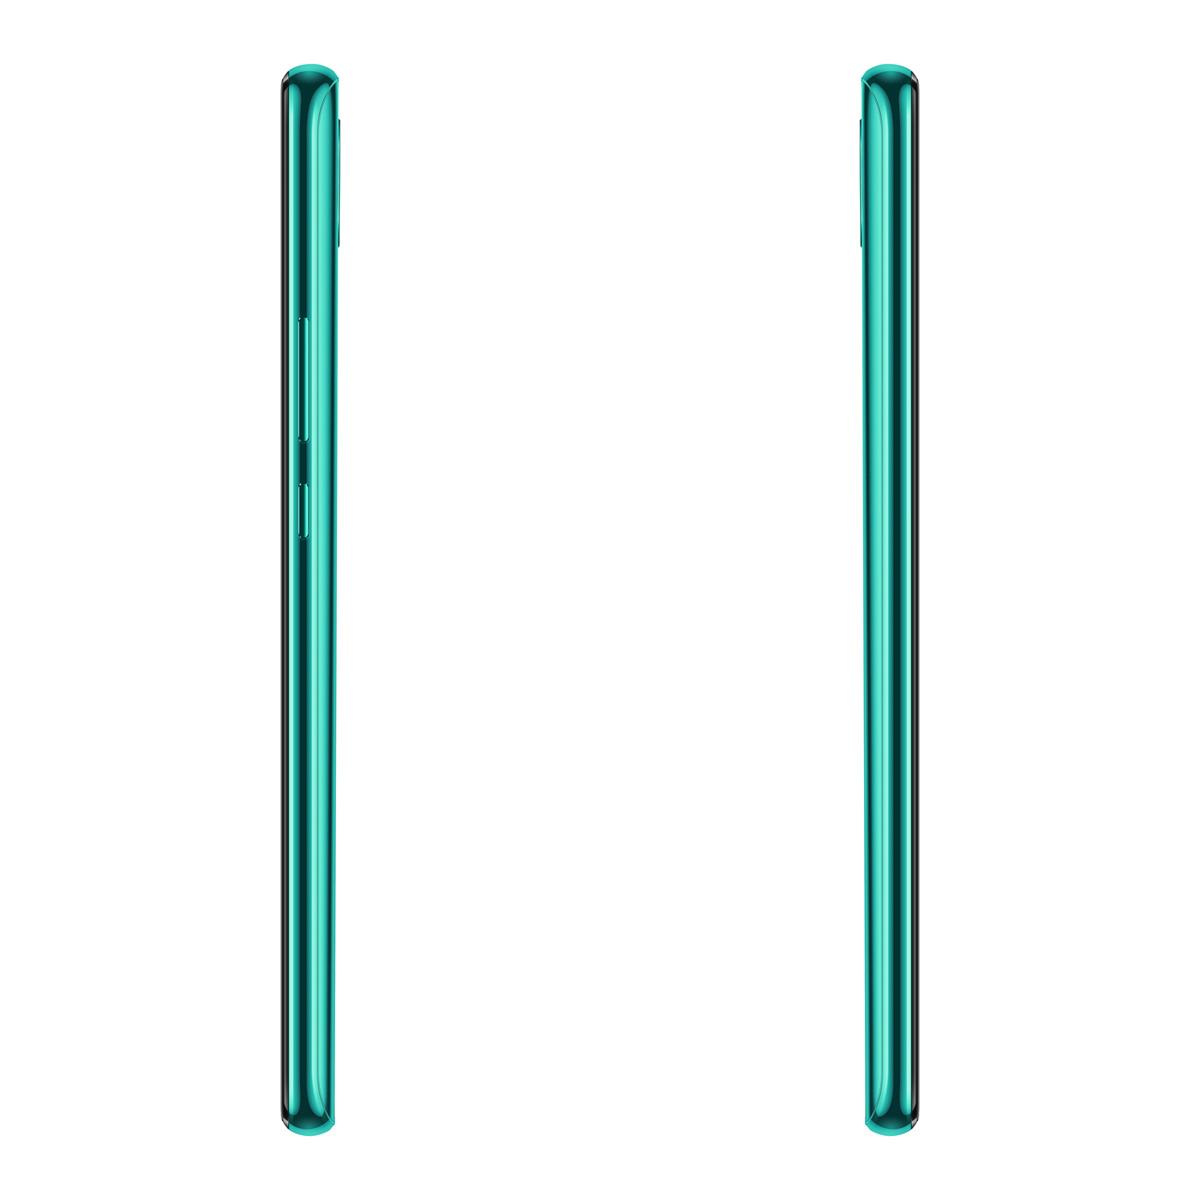 Buy Huawei Y9 Prime (2019) (4GB+128GB) (Green) | Model HU-Y9